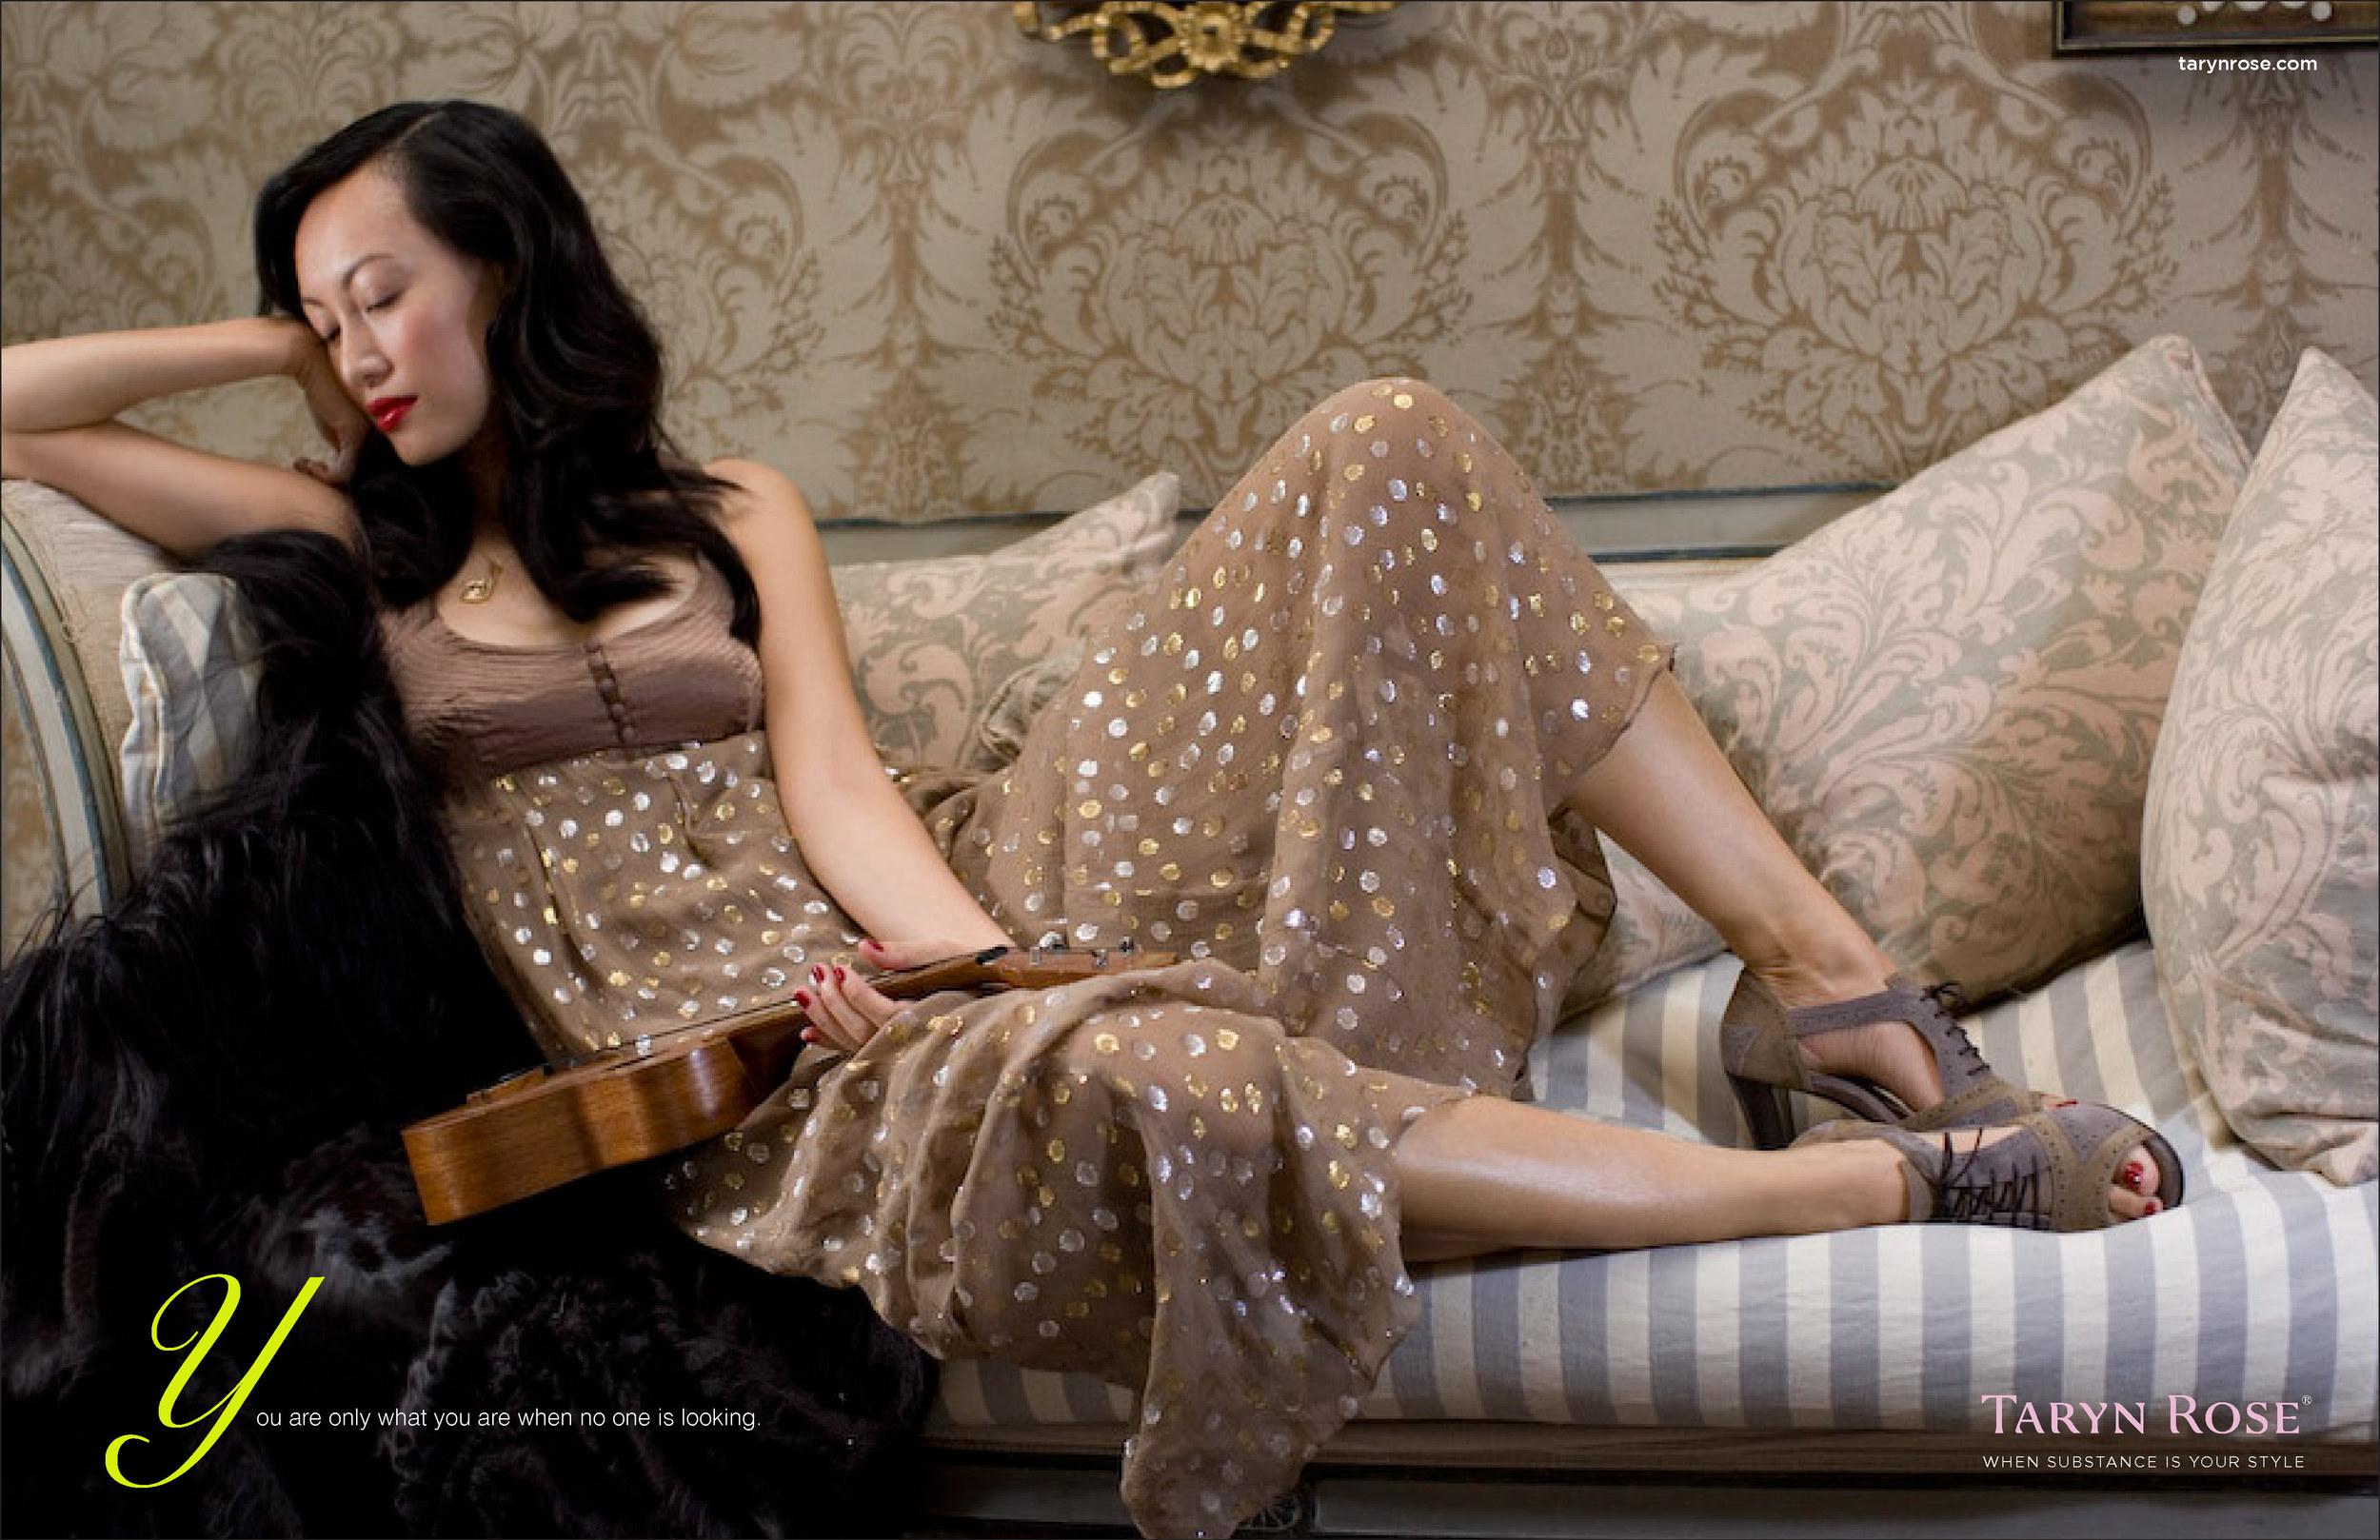 ative_Director_Taryn_Rose_Shoes_print_recling_woman.jpg